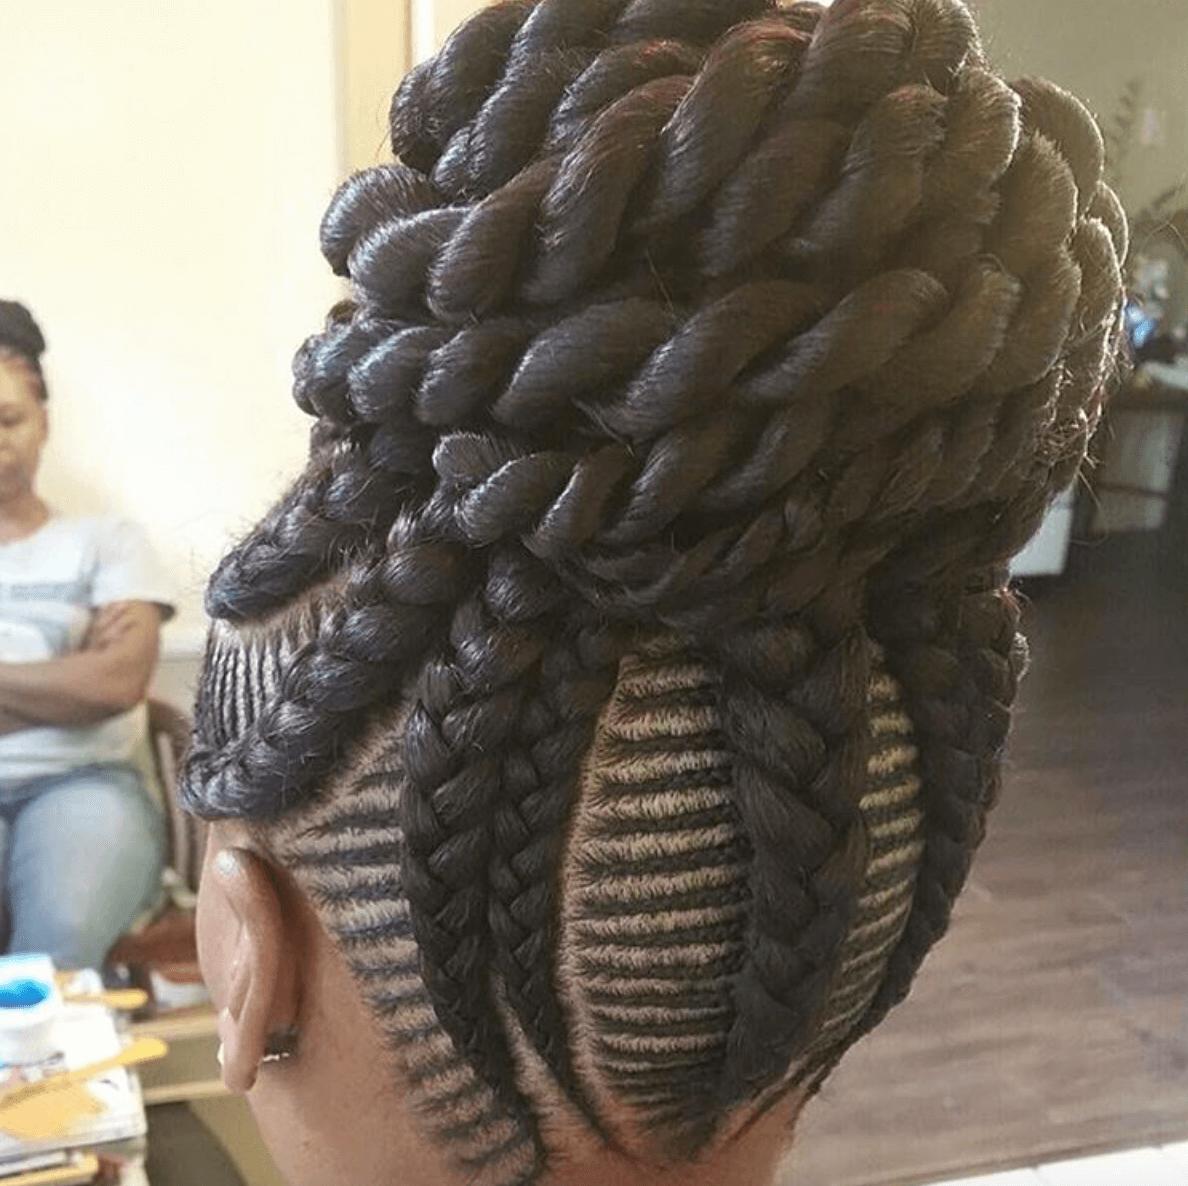 Cornrows Ghana and Senegalese Braids